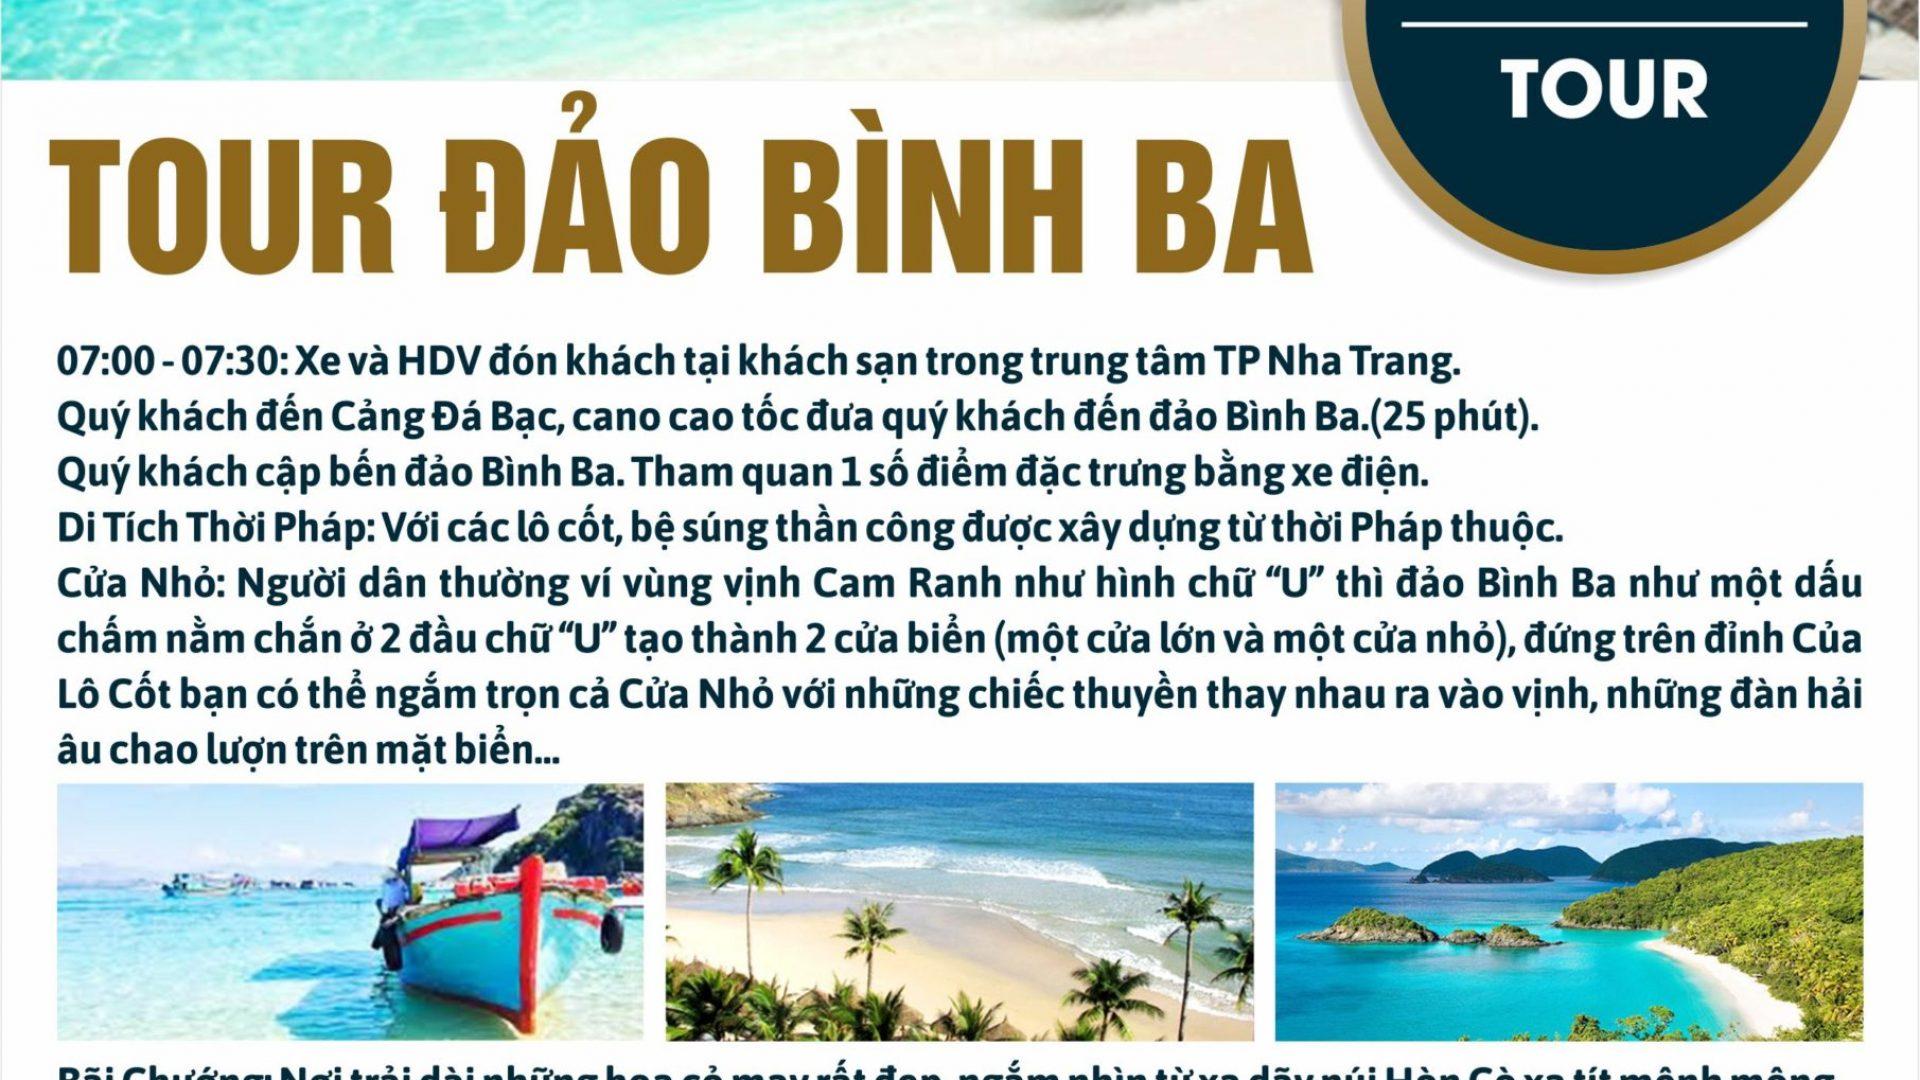 TOUR DAO BINH BA